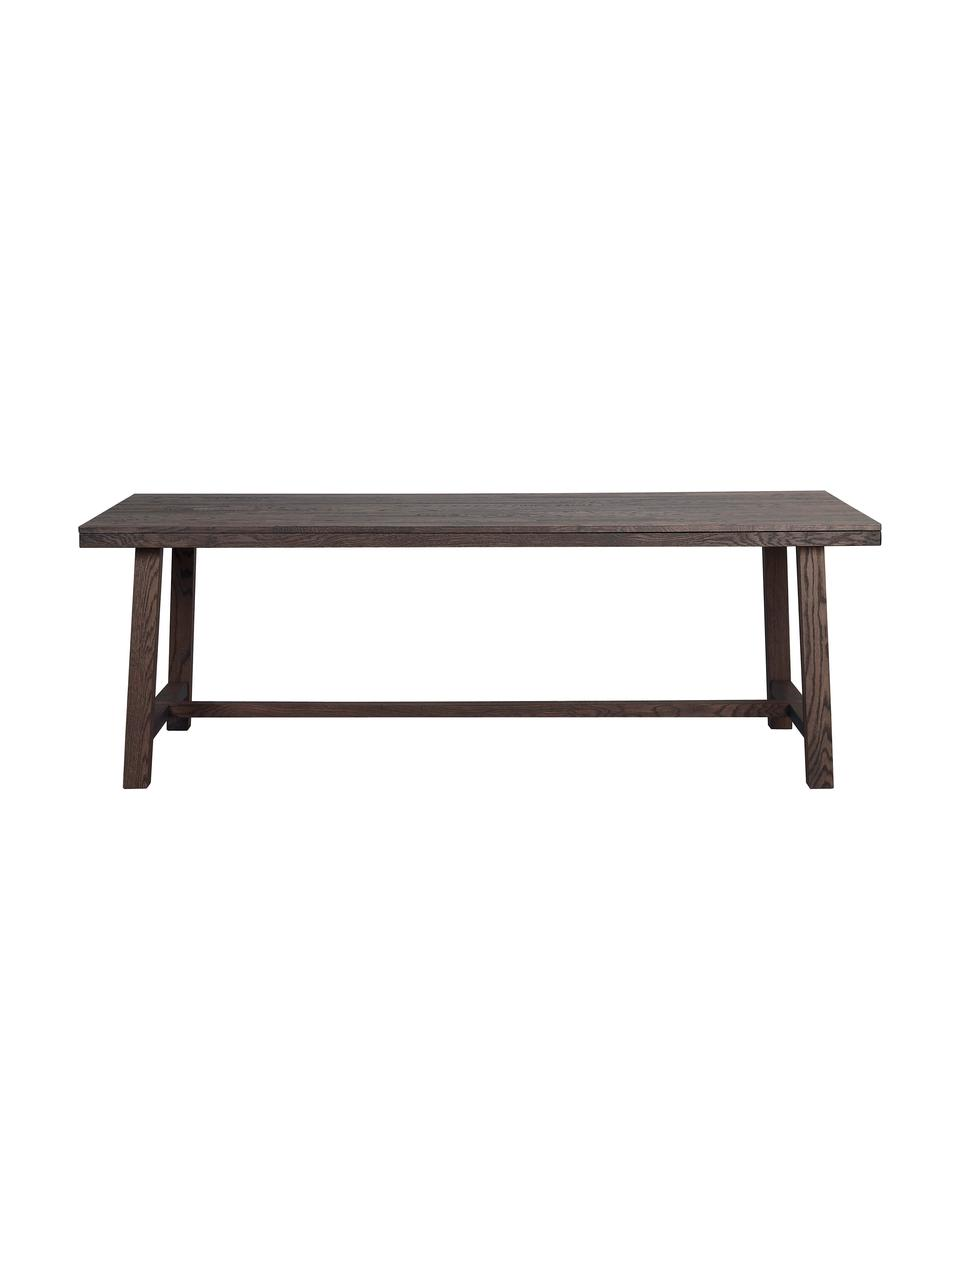 Grande table en bois massif Brooklyn, 220 x 95 cm, Chêne, teinté brun foncé